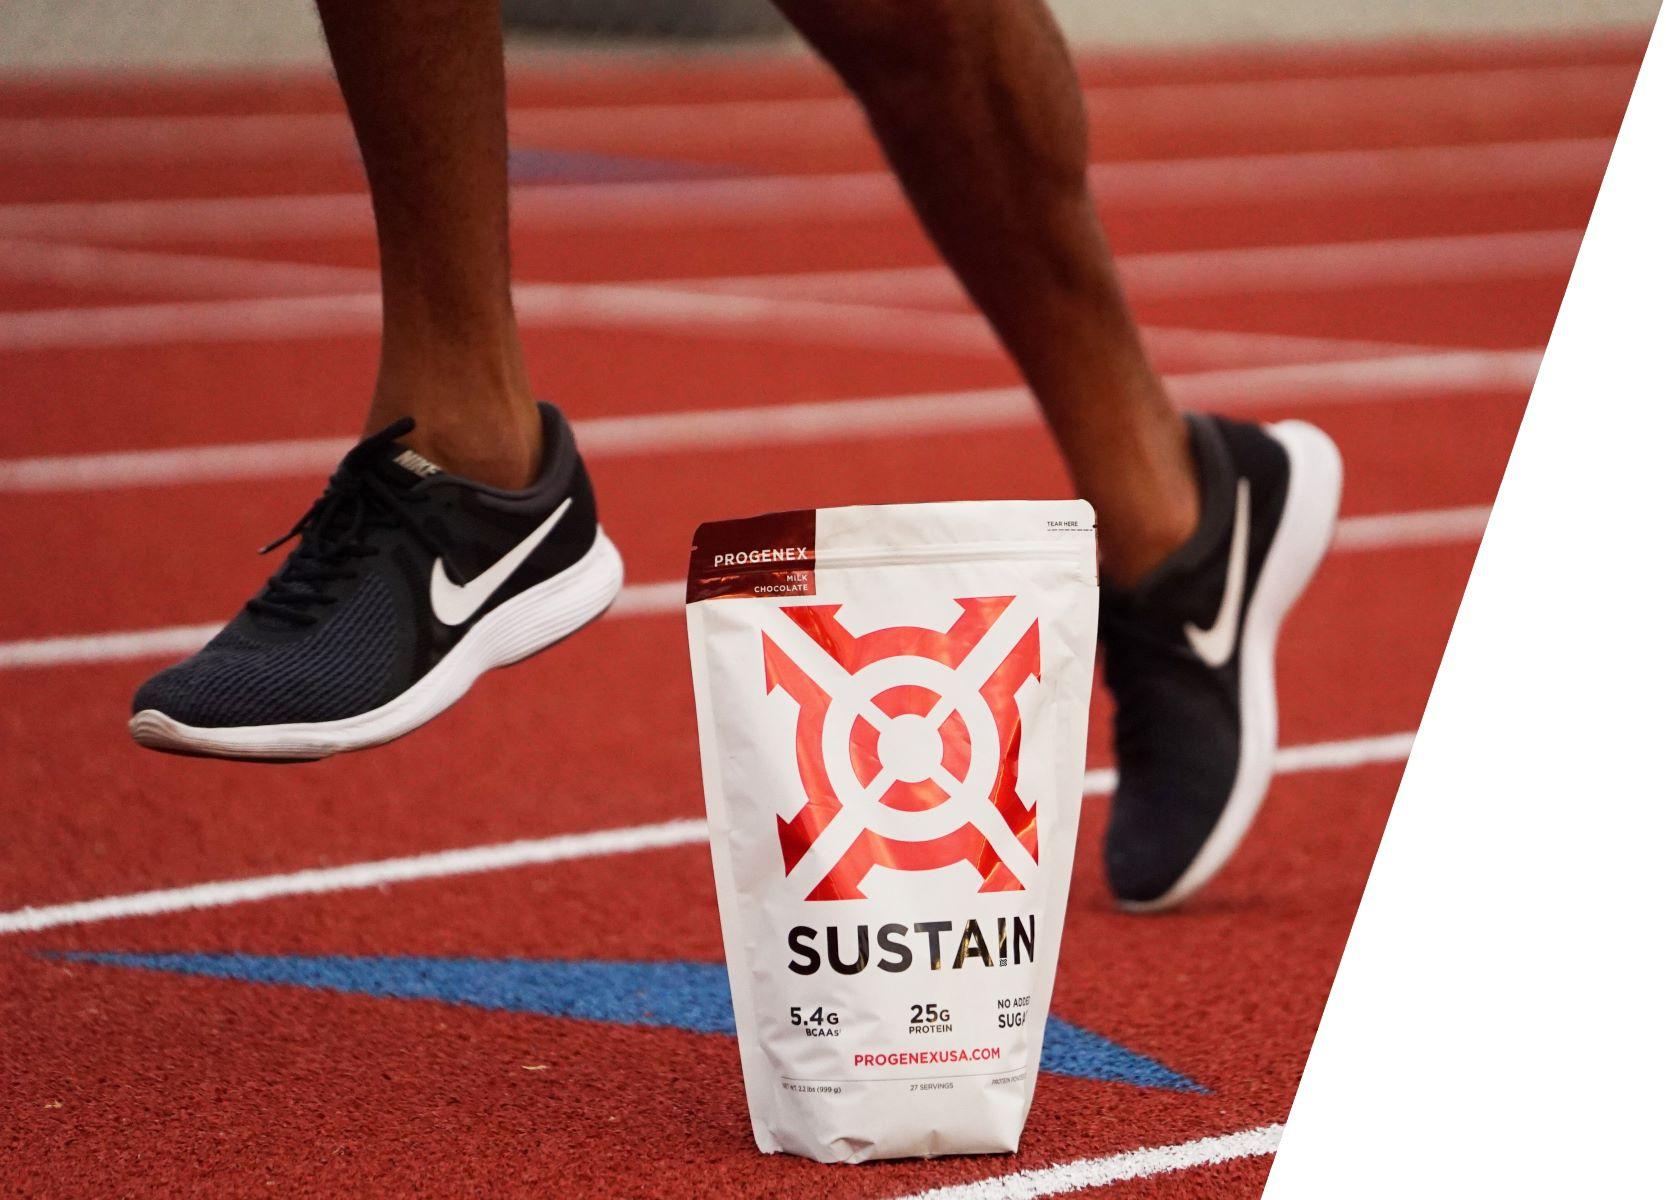 Progenex_whey_protien_isolate_Sustain_on_the_running_track